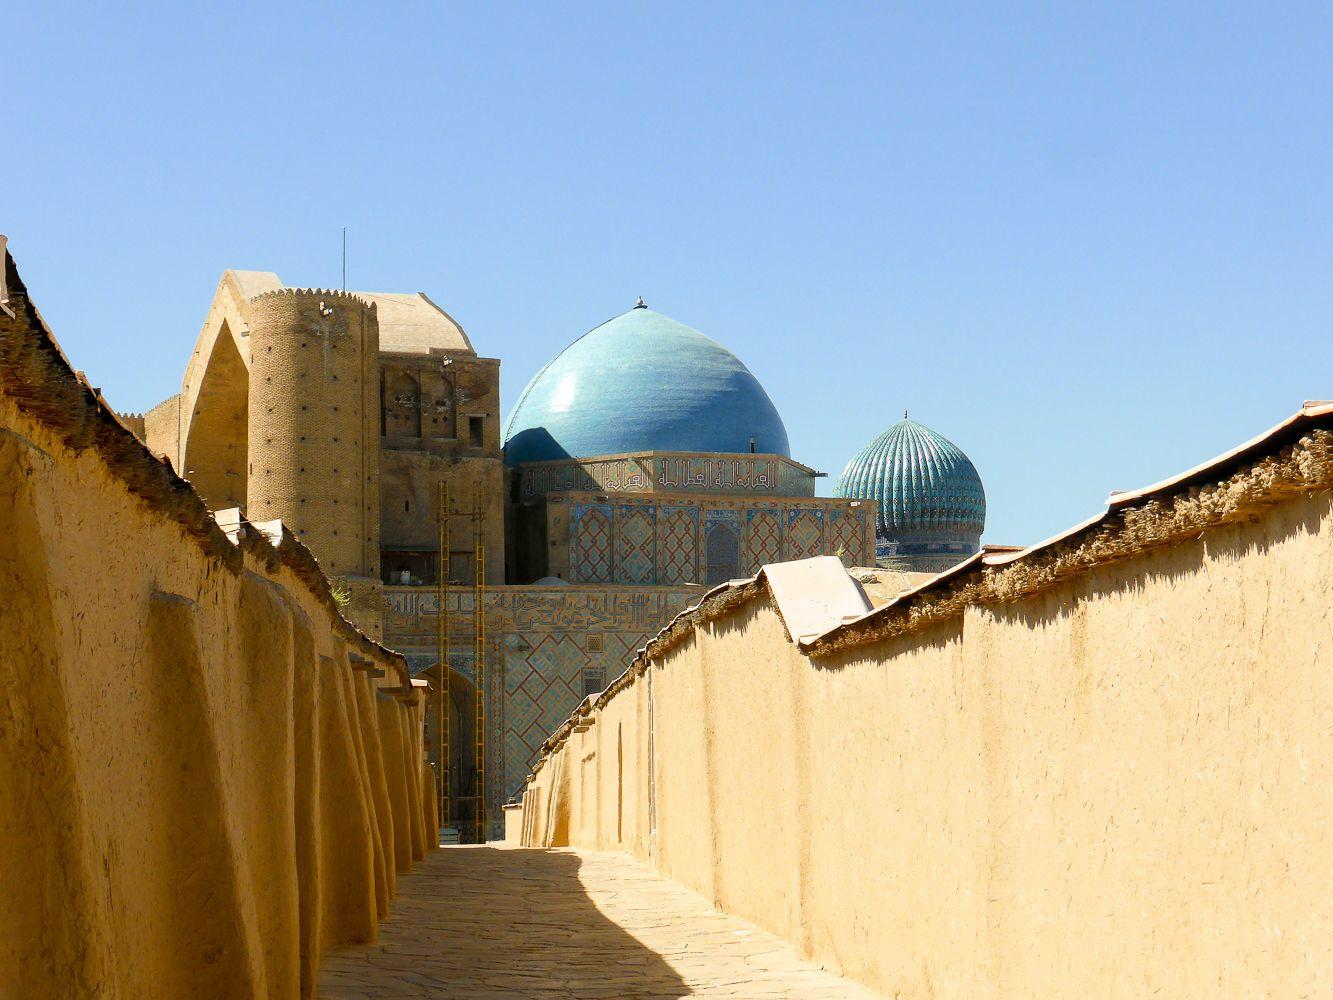 Central Asia, UNESCO Heritage, Kazakhstan